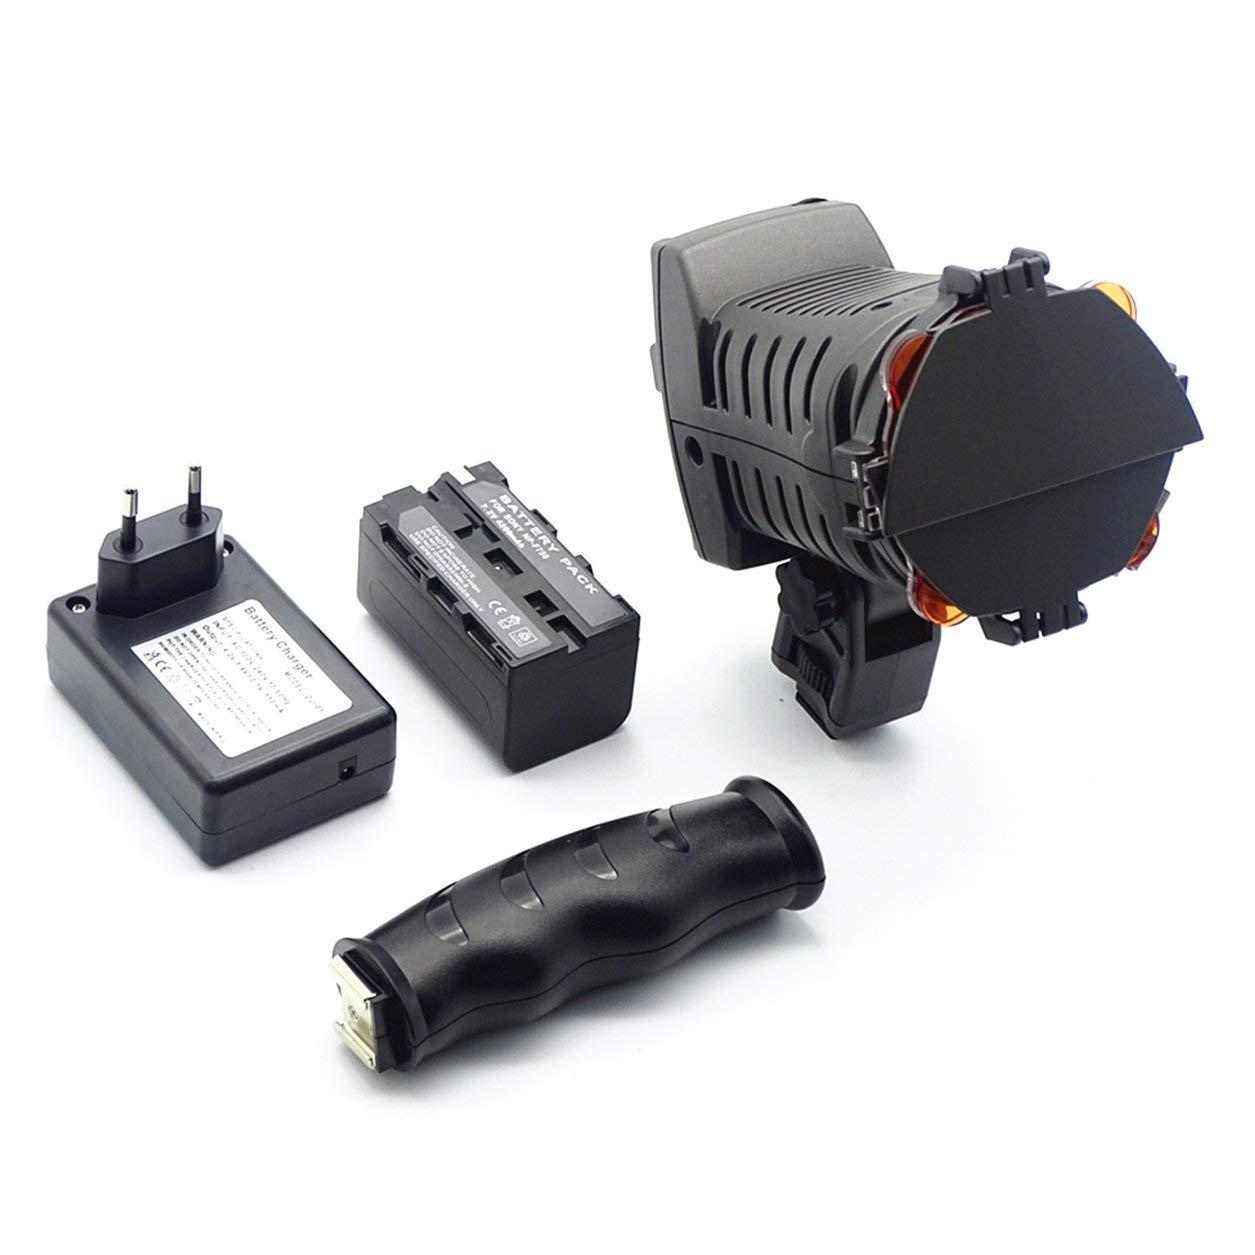 Kit LED-5010A Photo Professional Lighting SLR Camera luce fotografica,nero